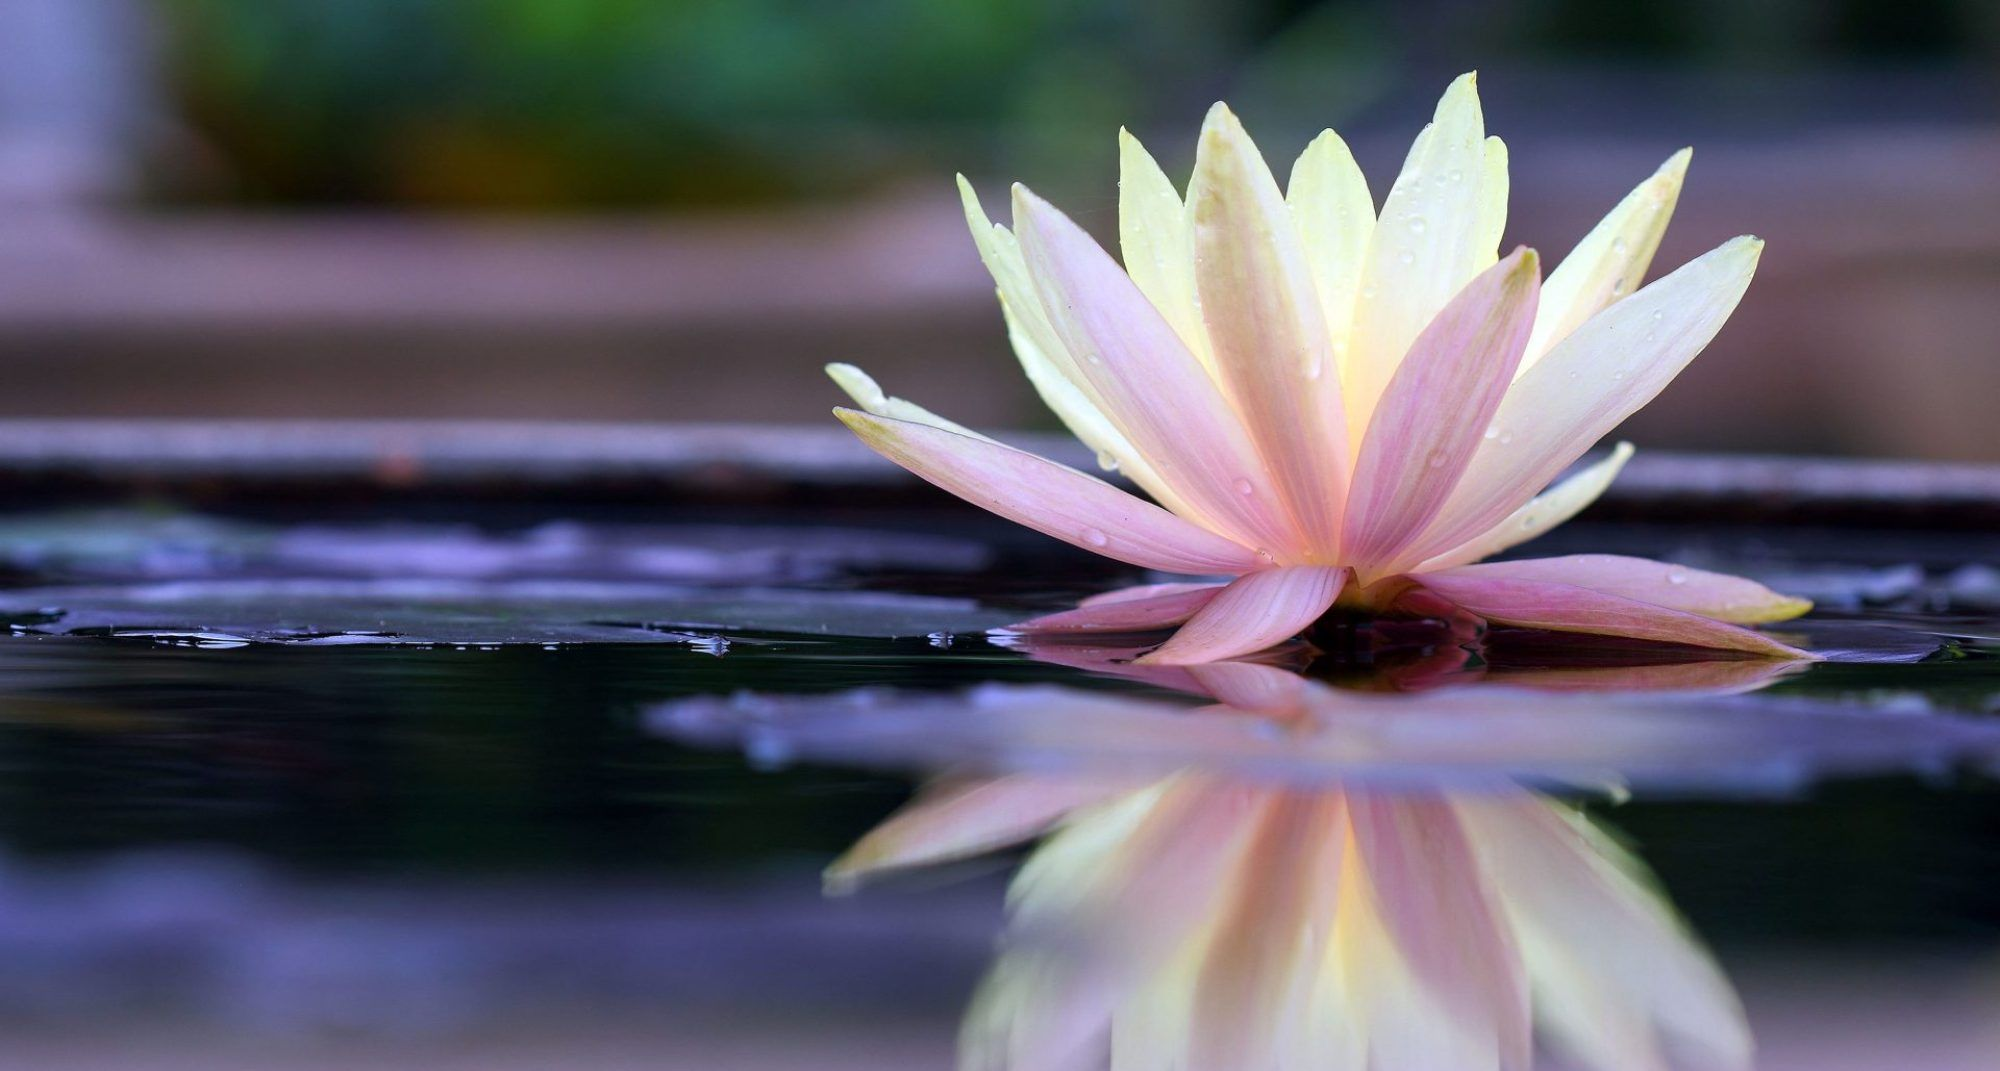 Song to the White Lotus 白蓮歌 Lotus, Flowers, Spirituality